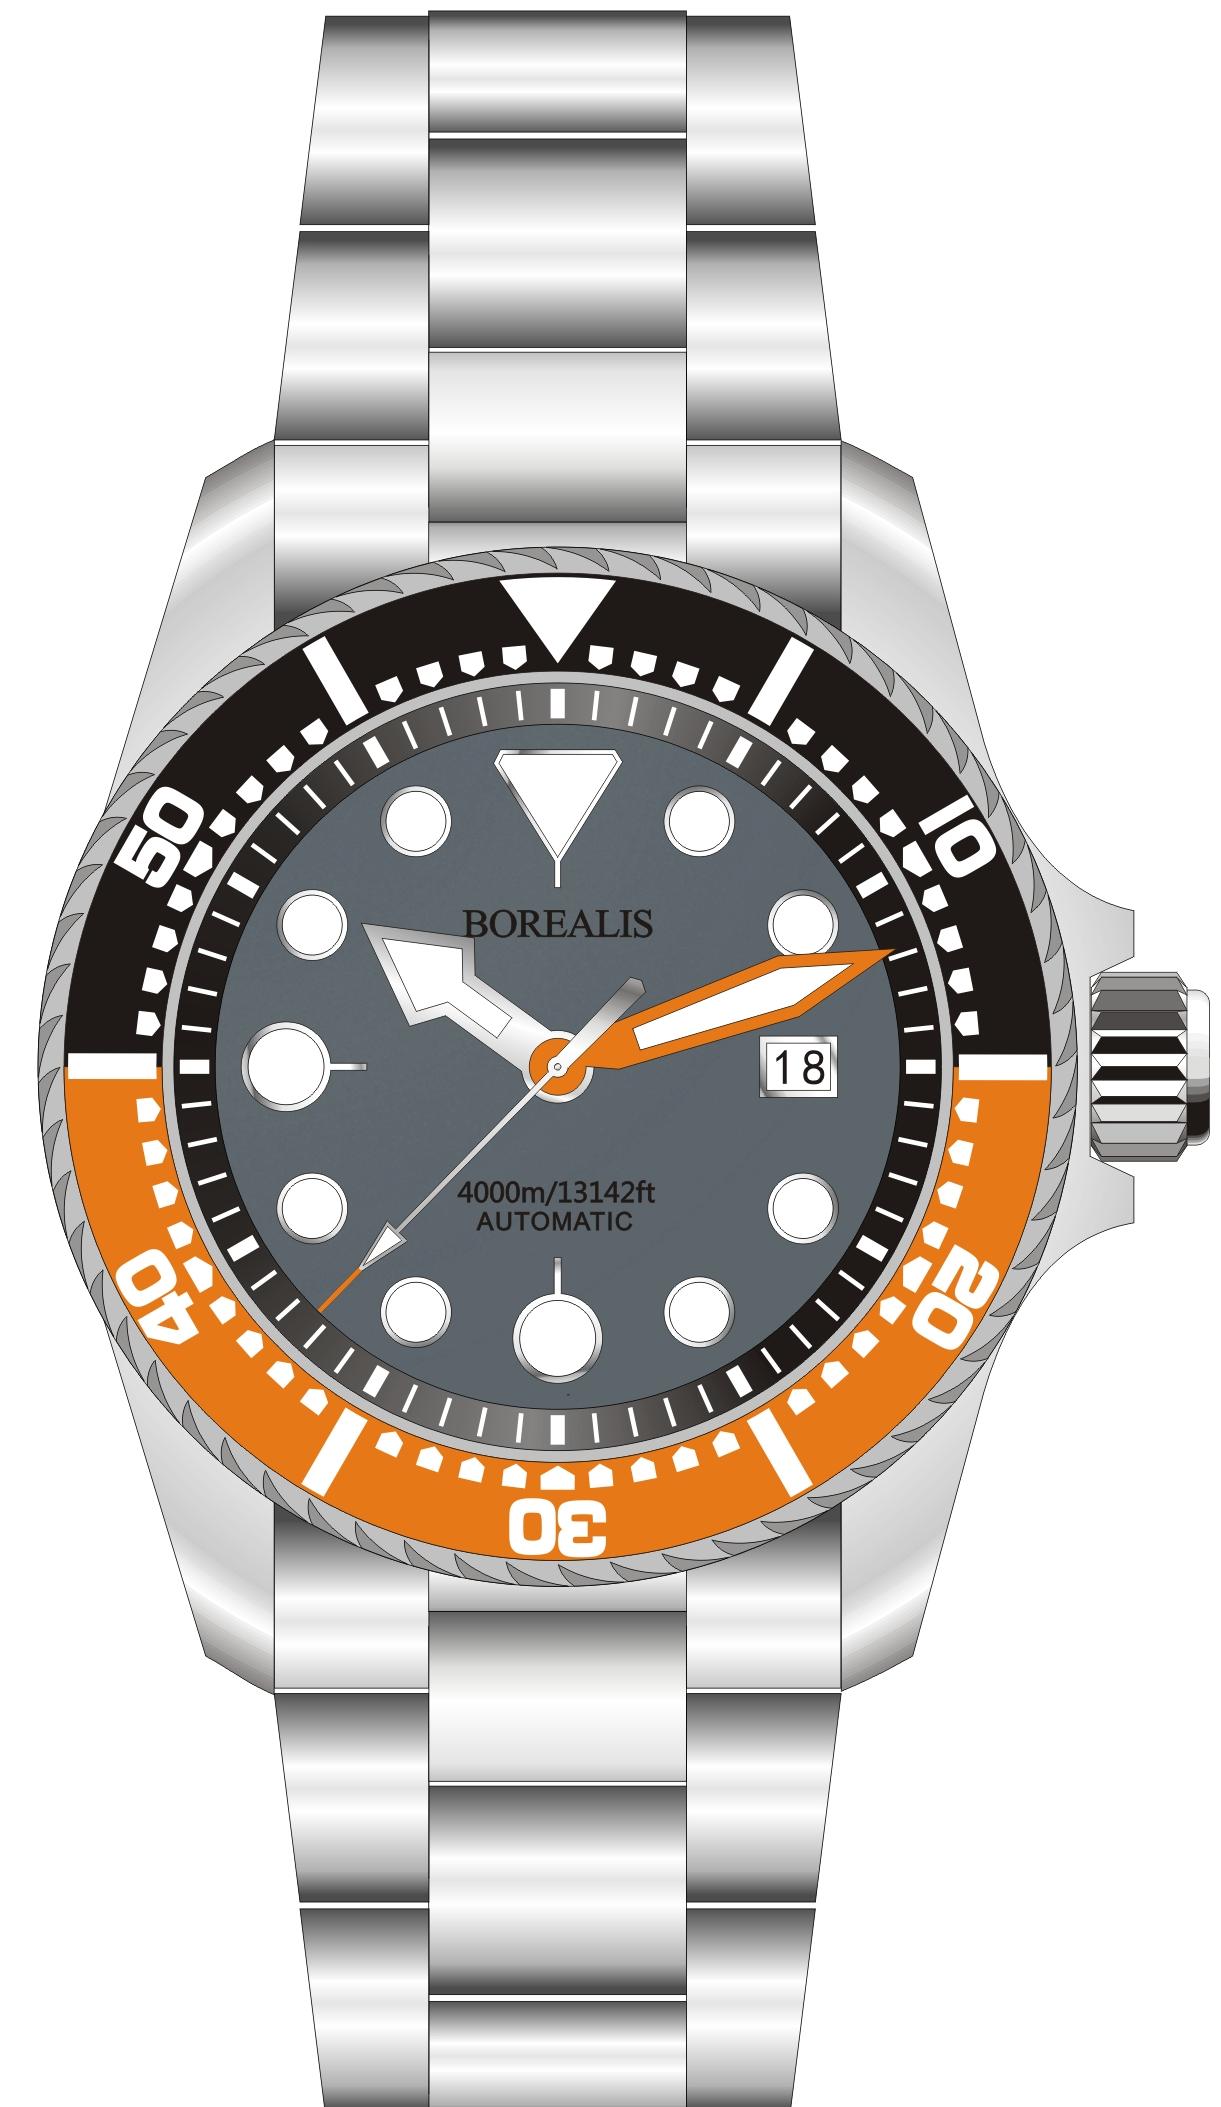 Borealis Seafarer II Stainless Steel Gray Orange BGW9 Sapphire Turbine Style Grip Bezel 4000m Miyota 9015 Automatic Diver Watch BSFIIGRAYORANGEBGW9